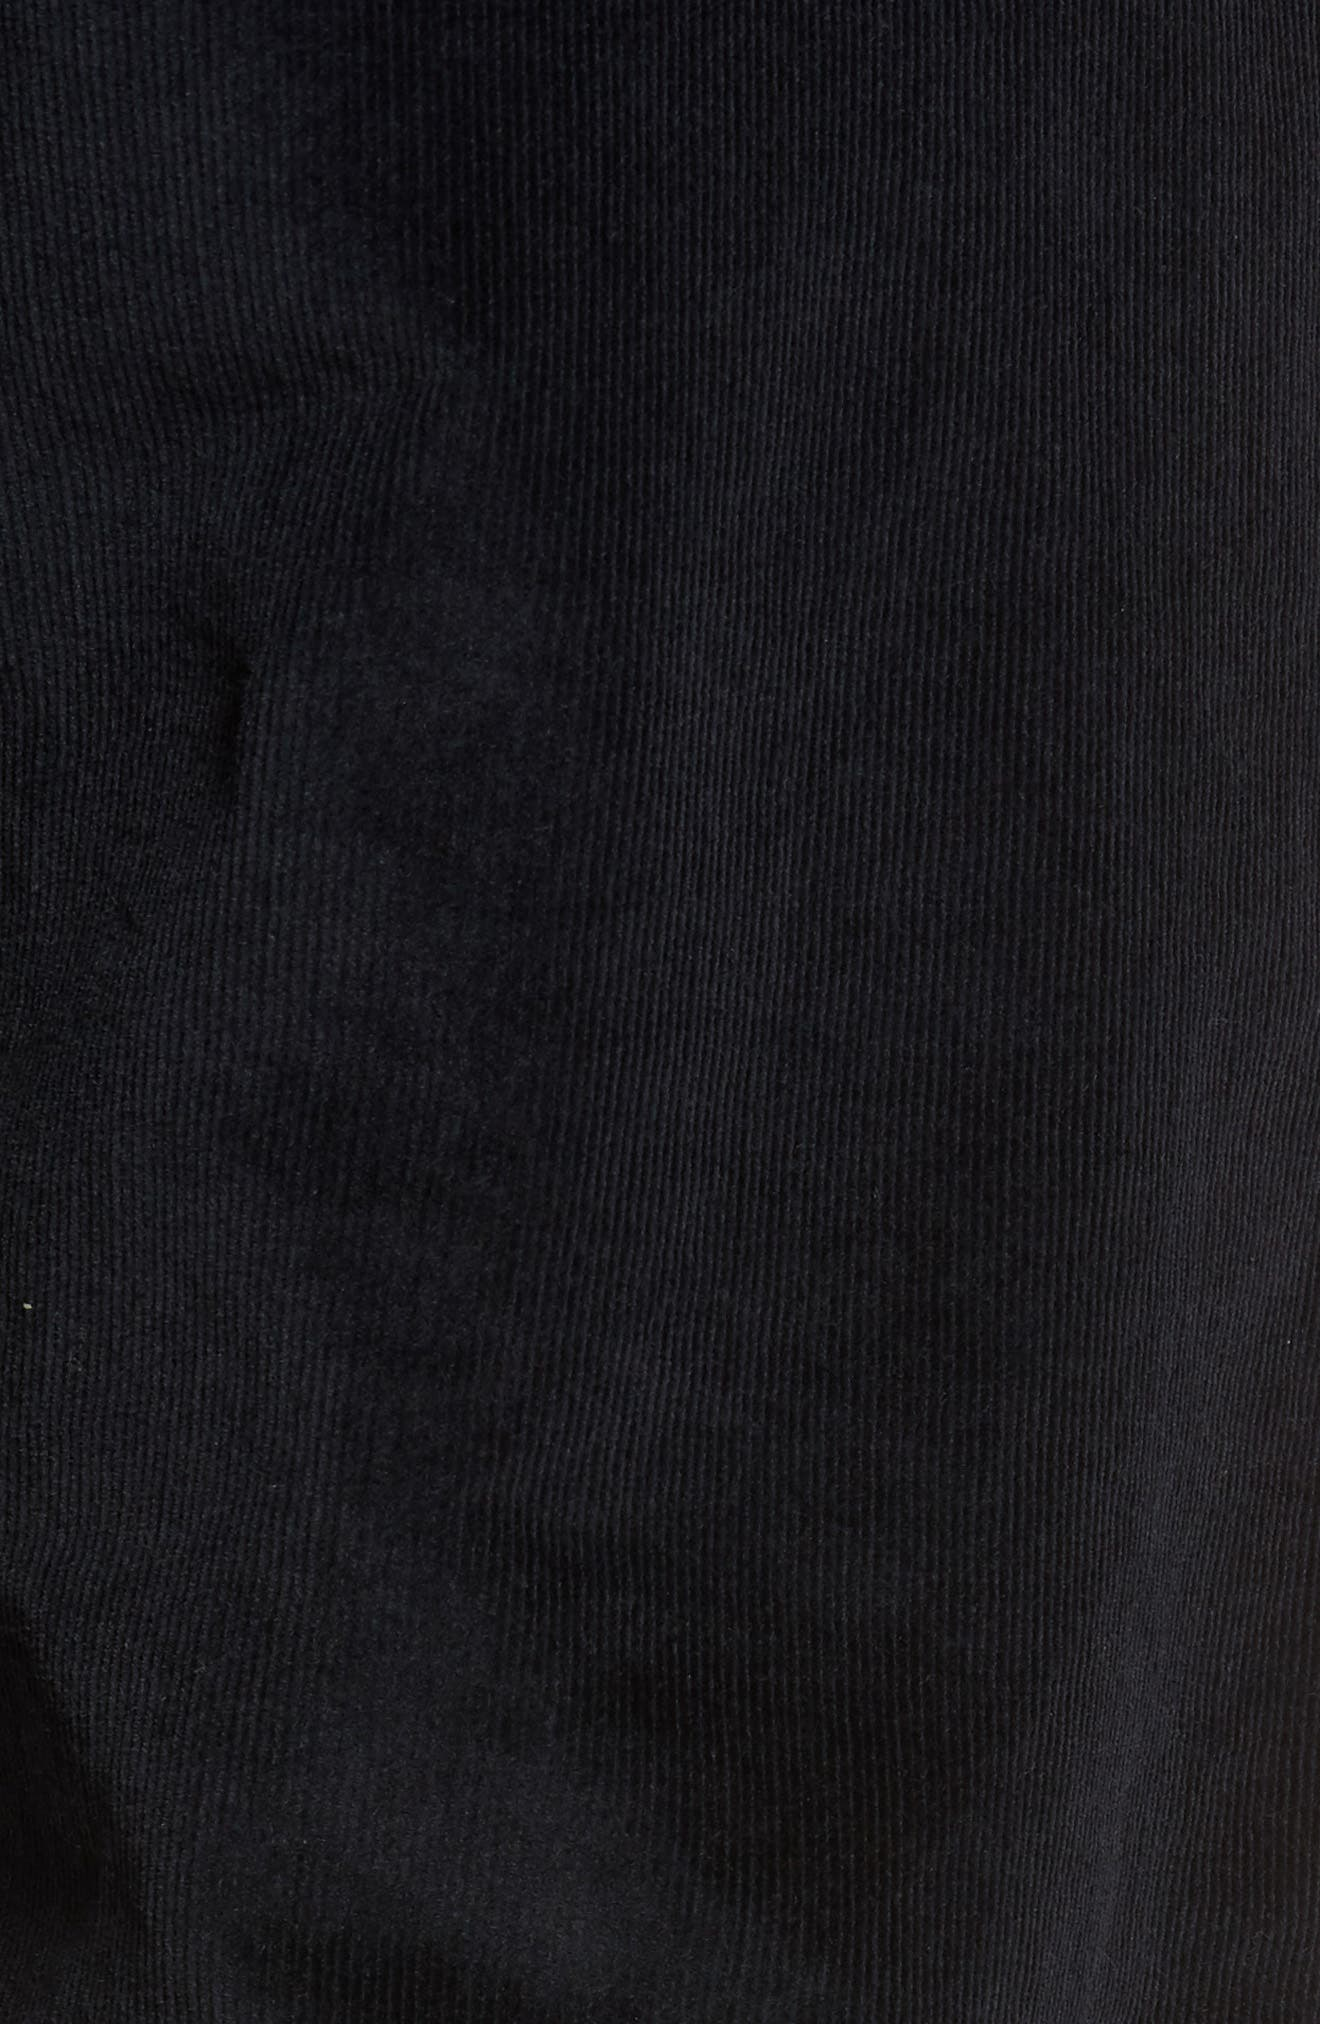 Naked & Famous Slim Chino Slim Fit Corduroy Pants,                             Alternate thumbnail 5, color,                             Black